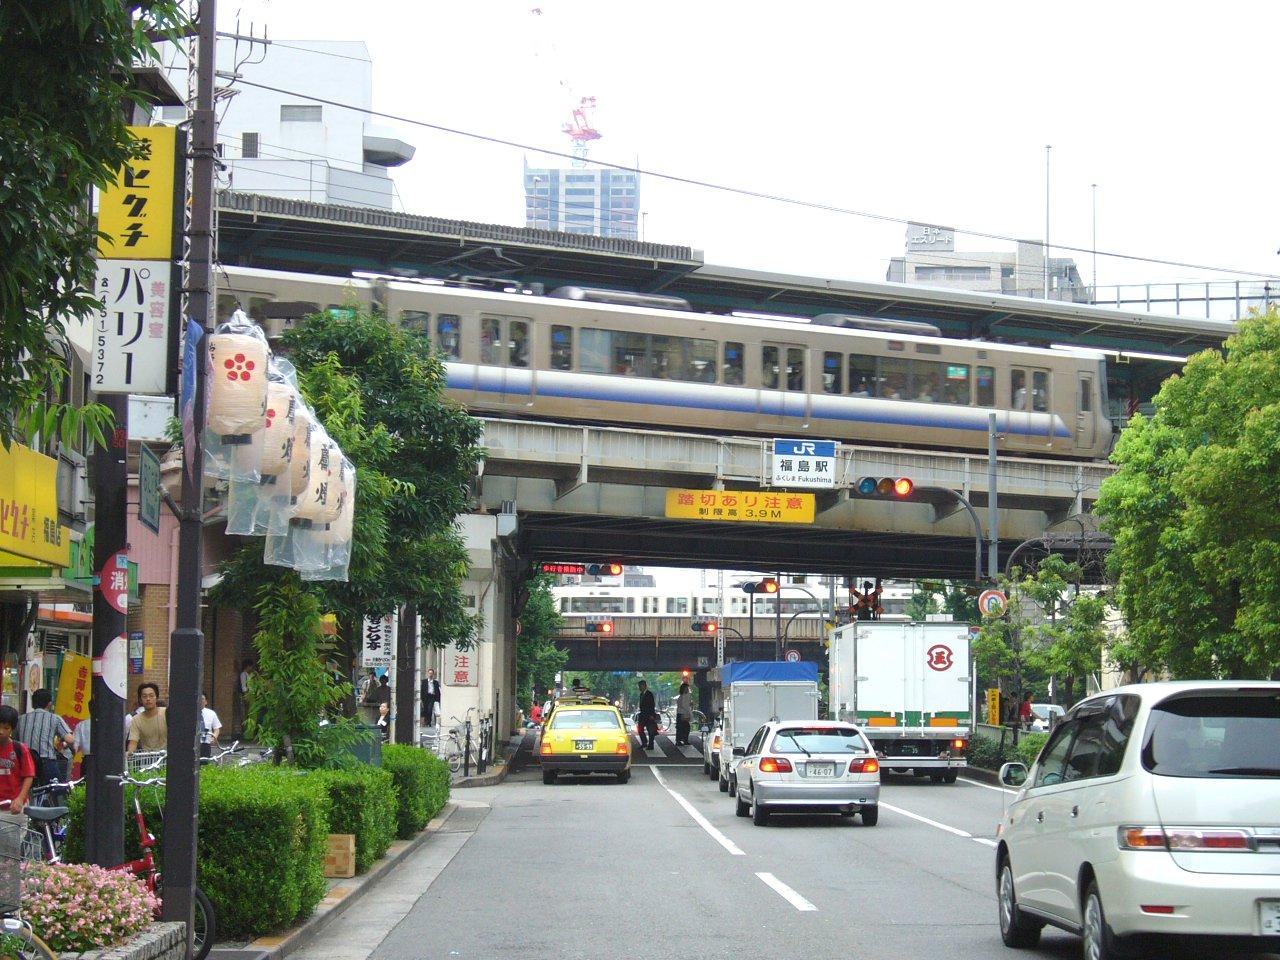 福島駅周辺の風景